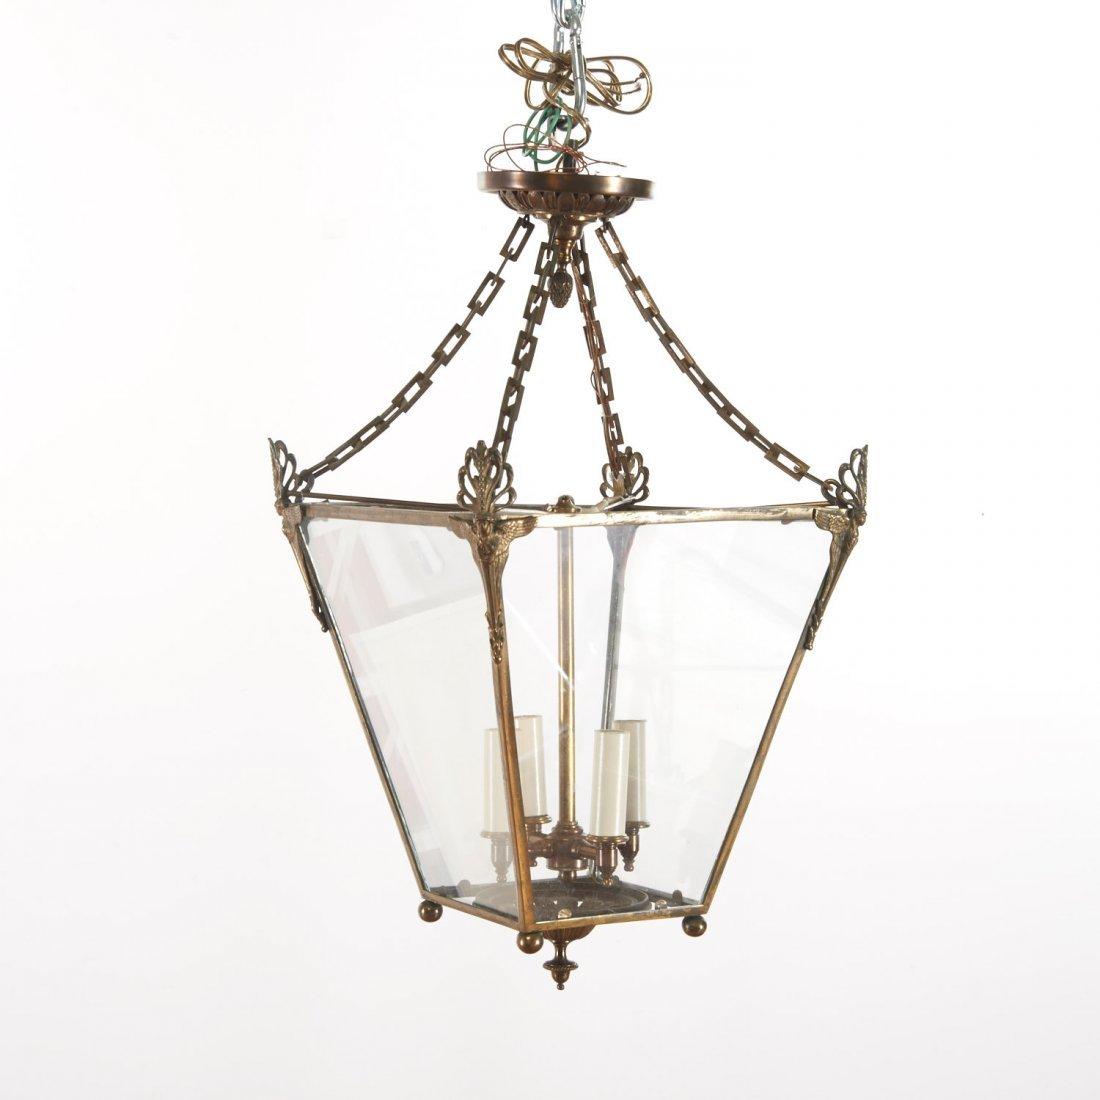 Neo-Classical style gilt metal hall lantern - 4